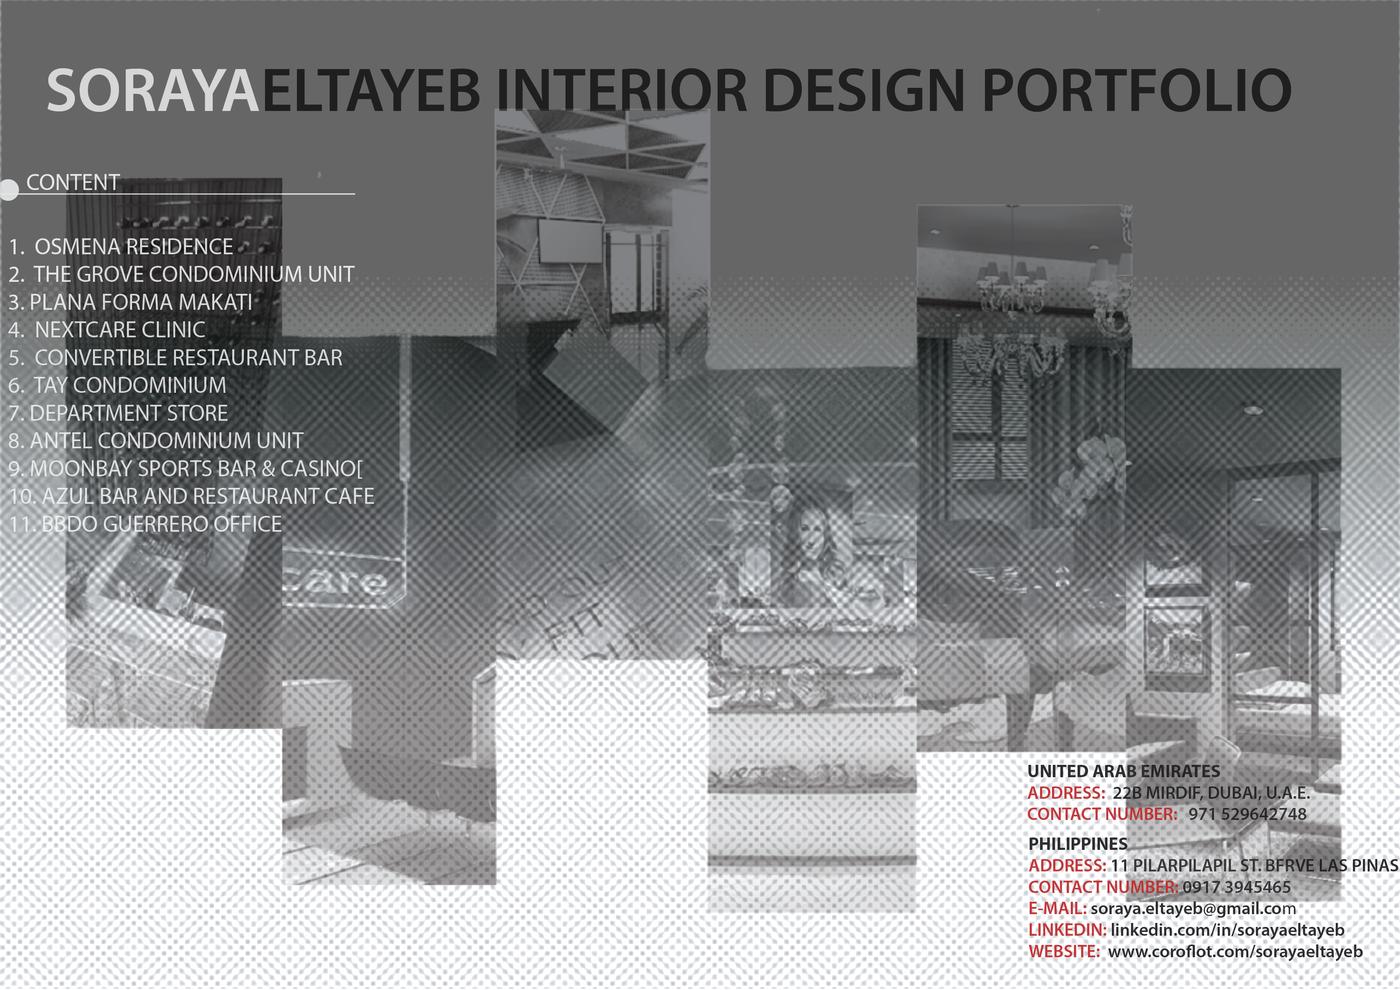 Interior Designer Portfolio By Soraya Eltayeb At Coroflot Com